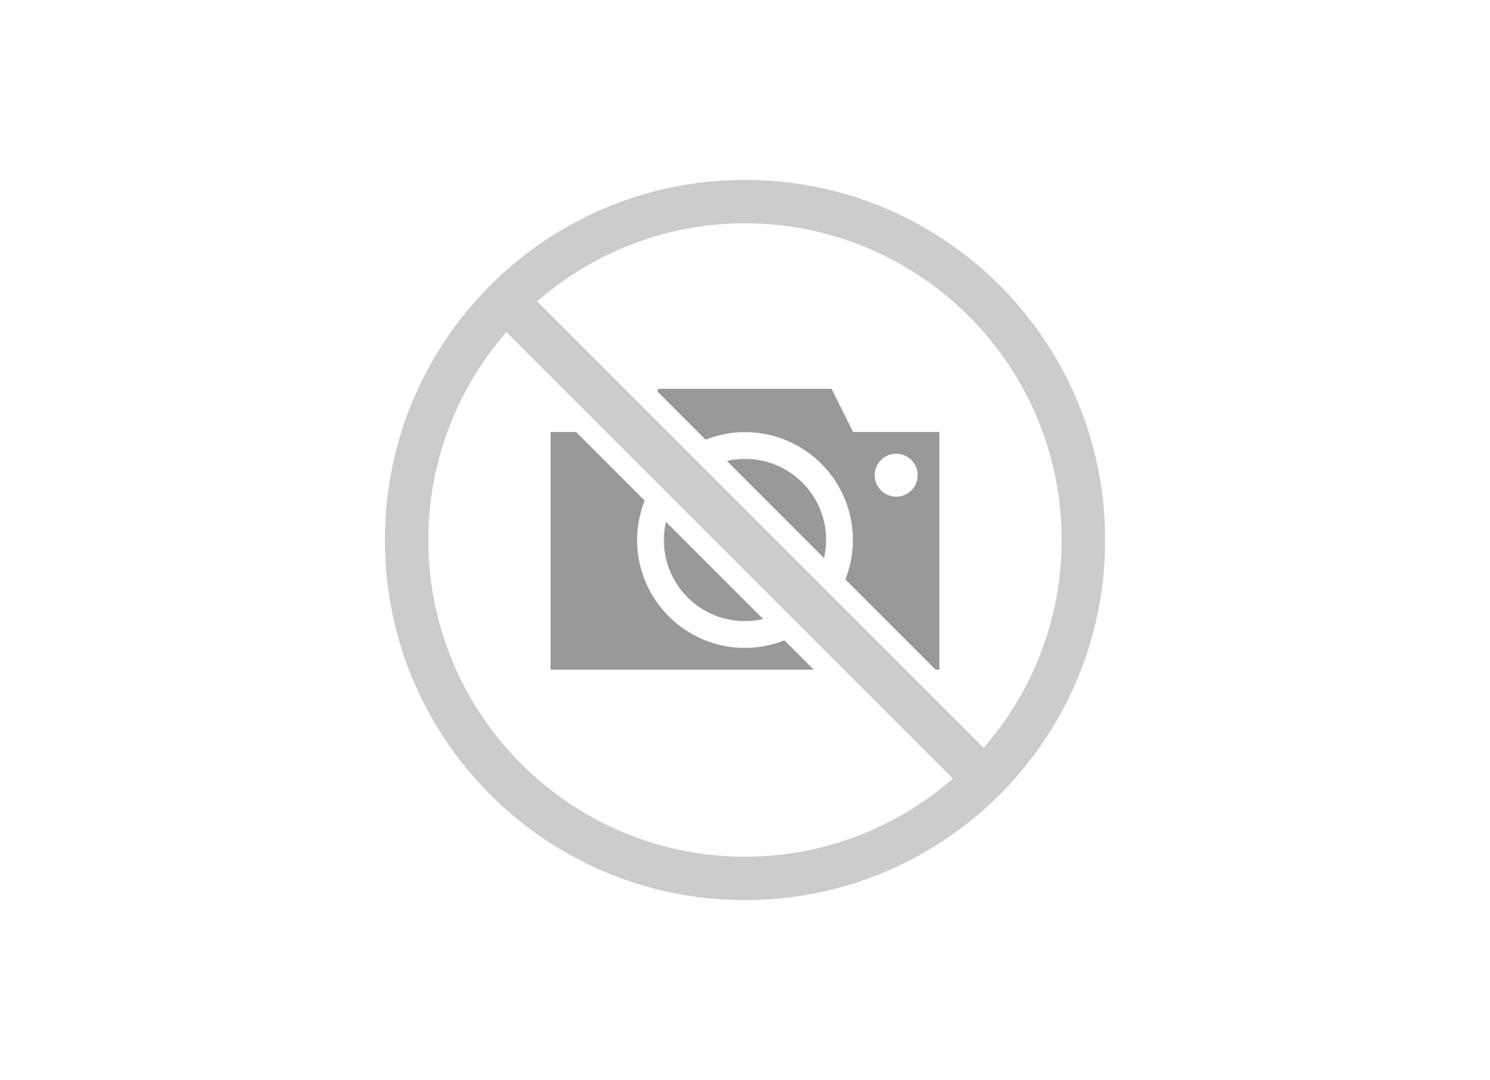 //www.autoline.com.br/carro/fiat/uno-10-attractive-6v-flex-4p-manual/2017/salvador-ba/6612911